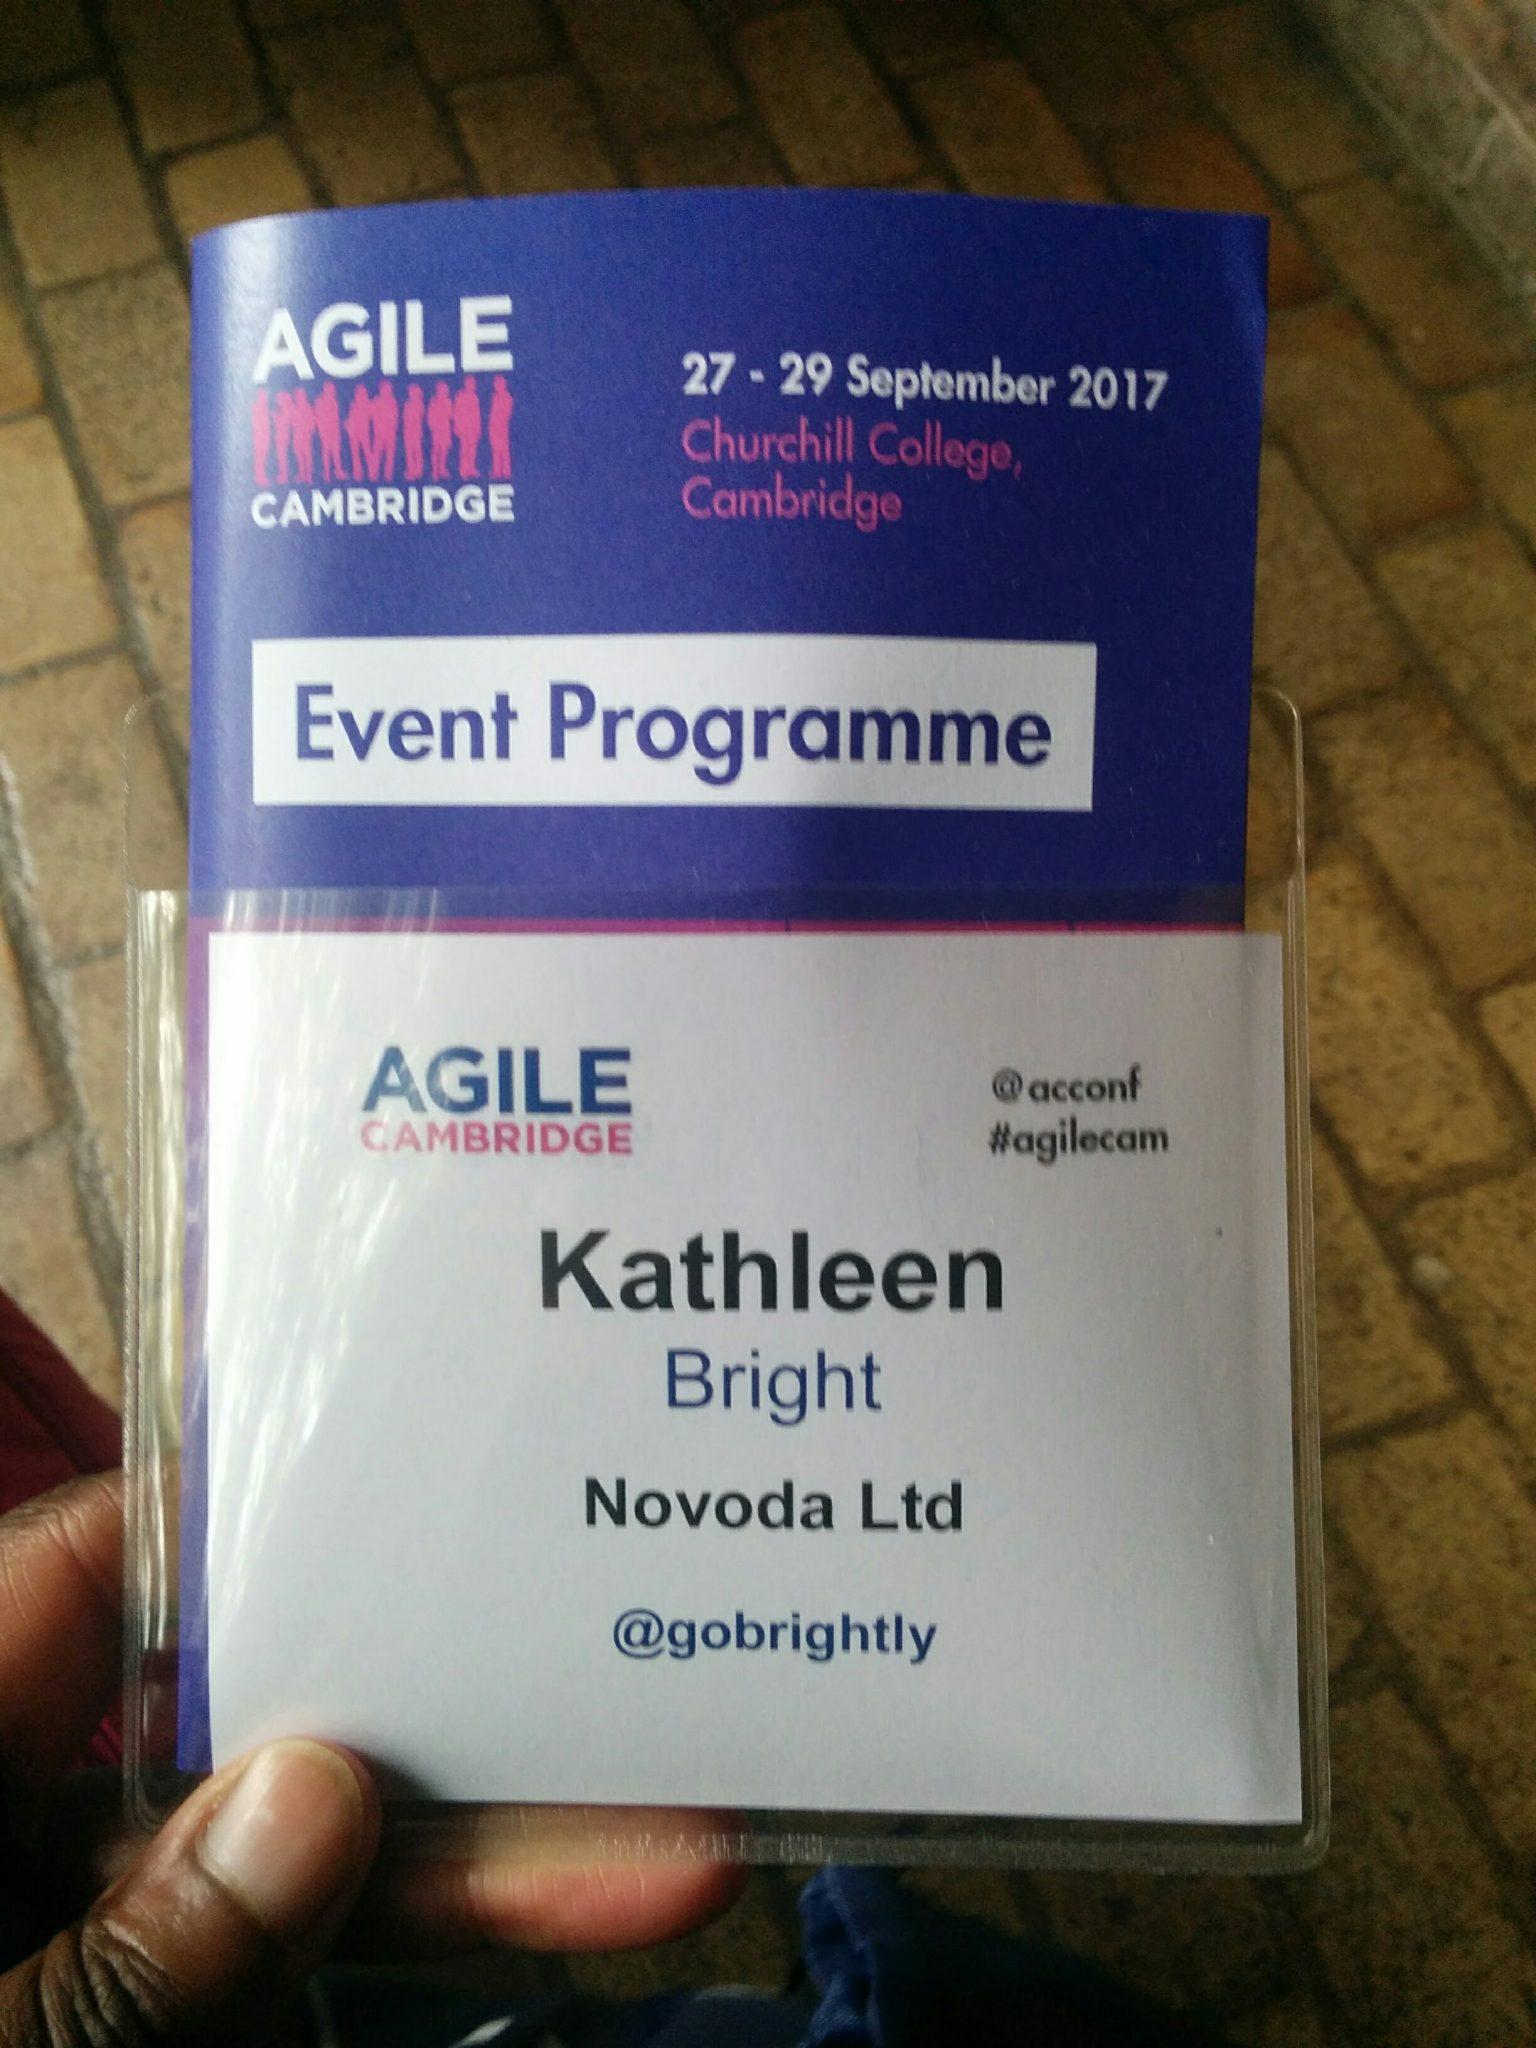 Kathleen Bright's name tag for Agile Cambridge 2017